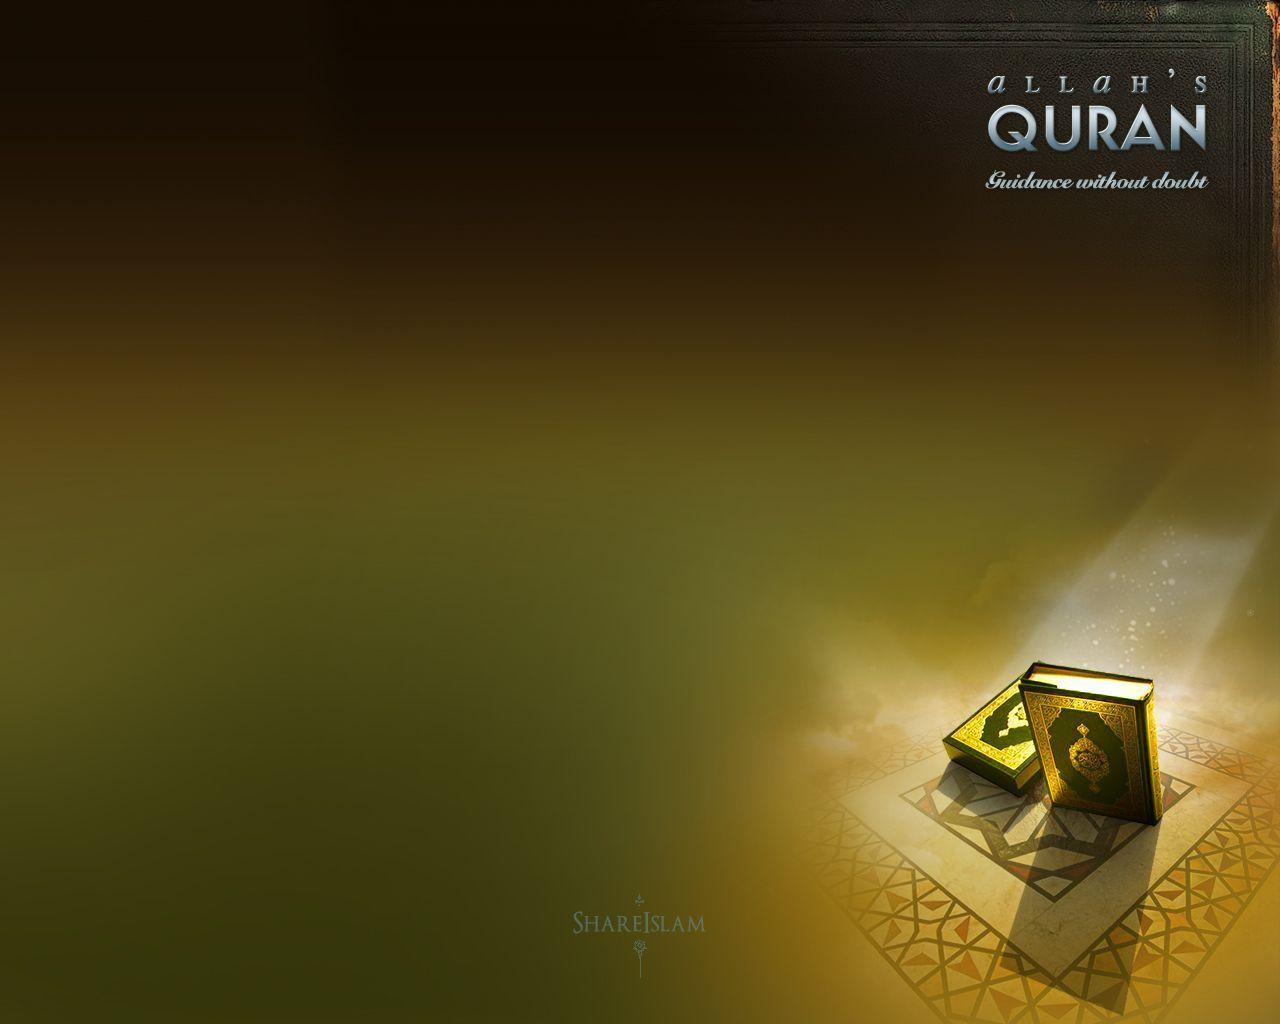 Wallpapers iphone quran - Quran Wallpapers Wallpaper Cave